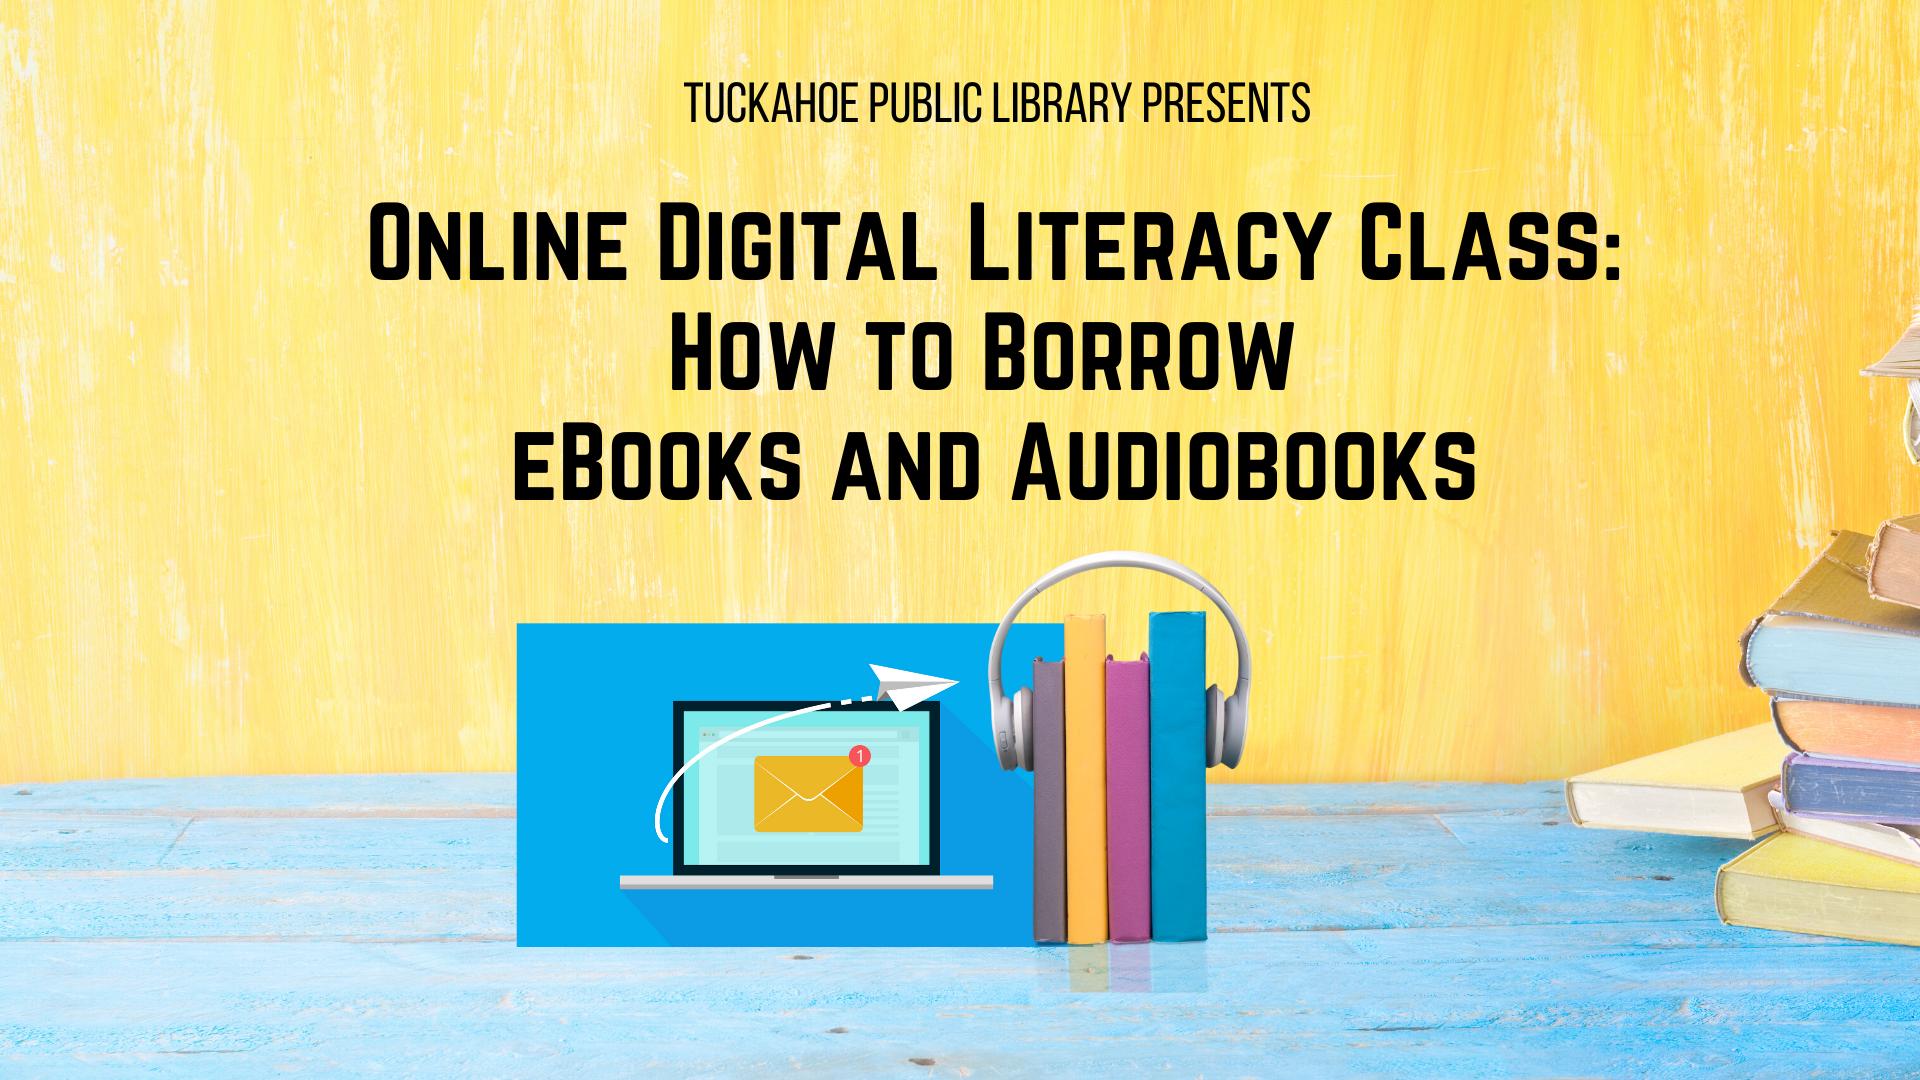 Digital Literacy - How to Borrow E-books & Audiobooks